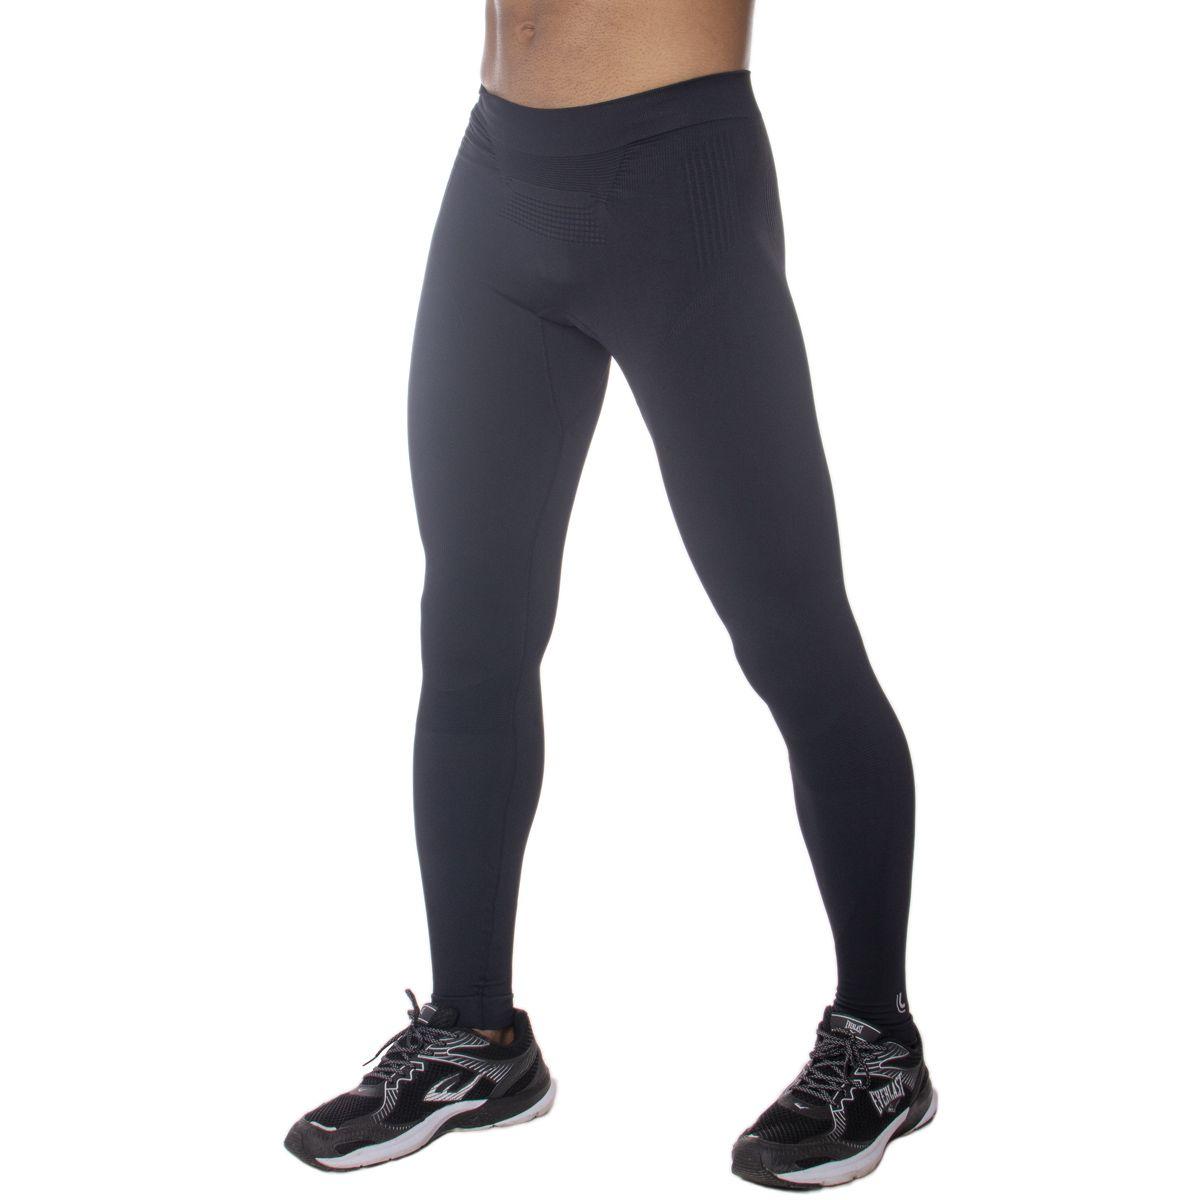 Calça Térmica Masculina Lupo Sem Costura - Calça Compressão  X-RUN EMANA Lupo